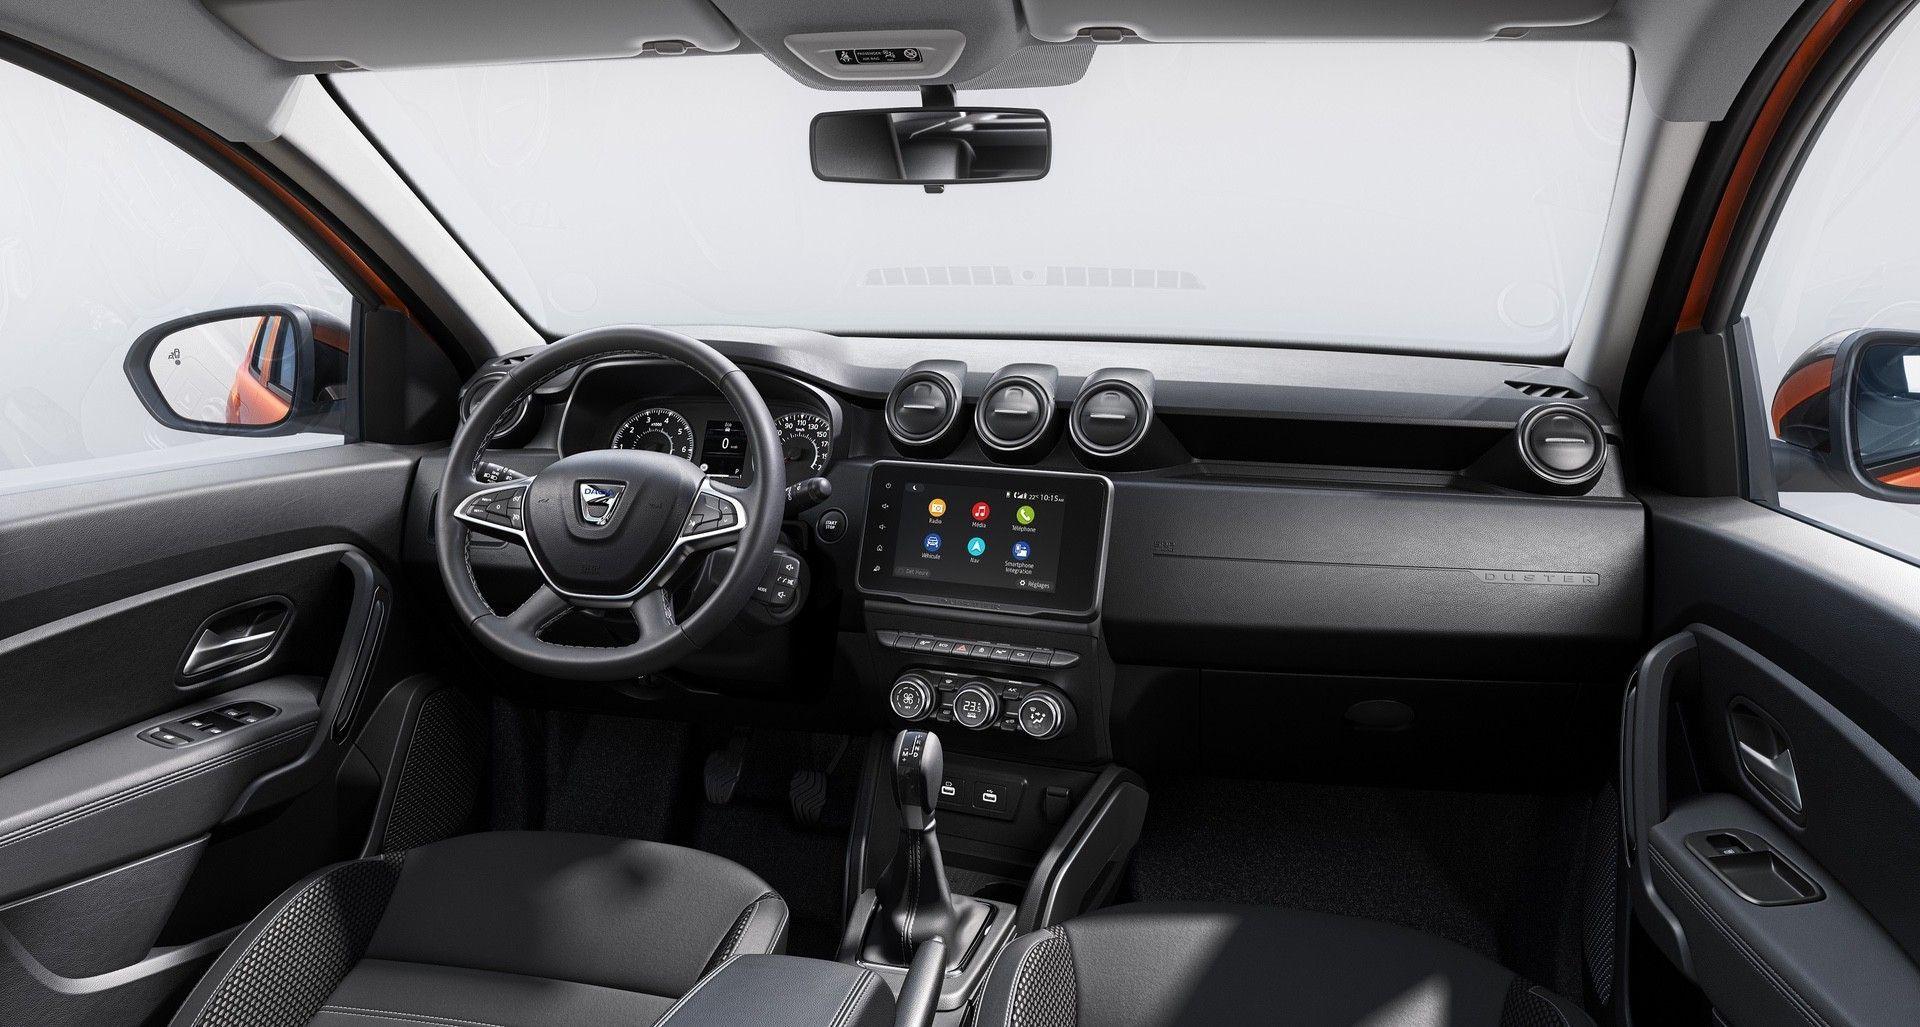 2021_Dacia_Duster_facelift-0007